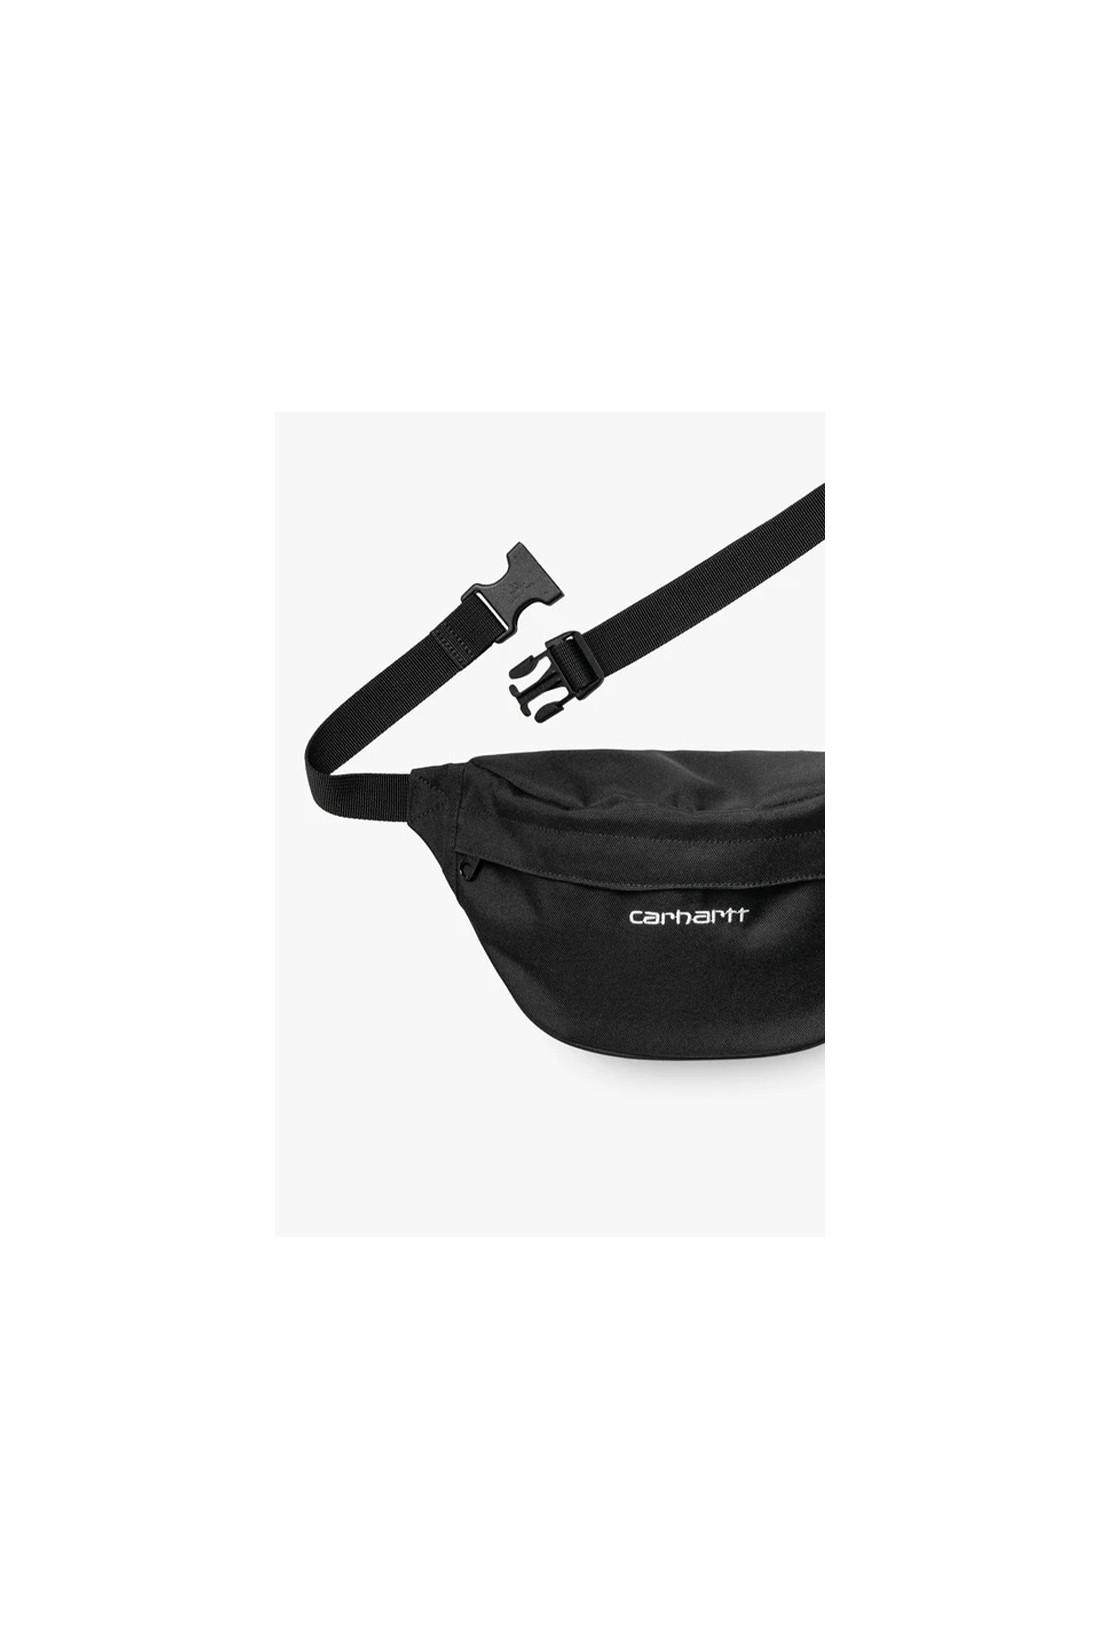 CARHARTT WIP / Payton hip bag Black white